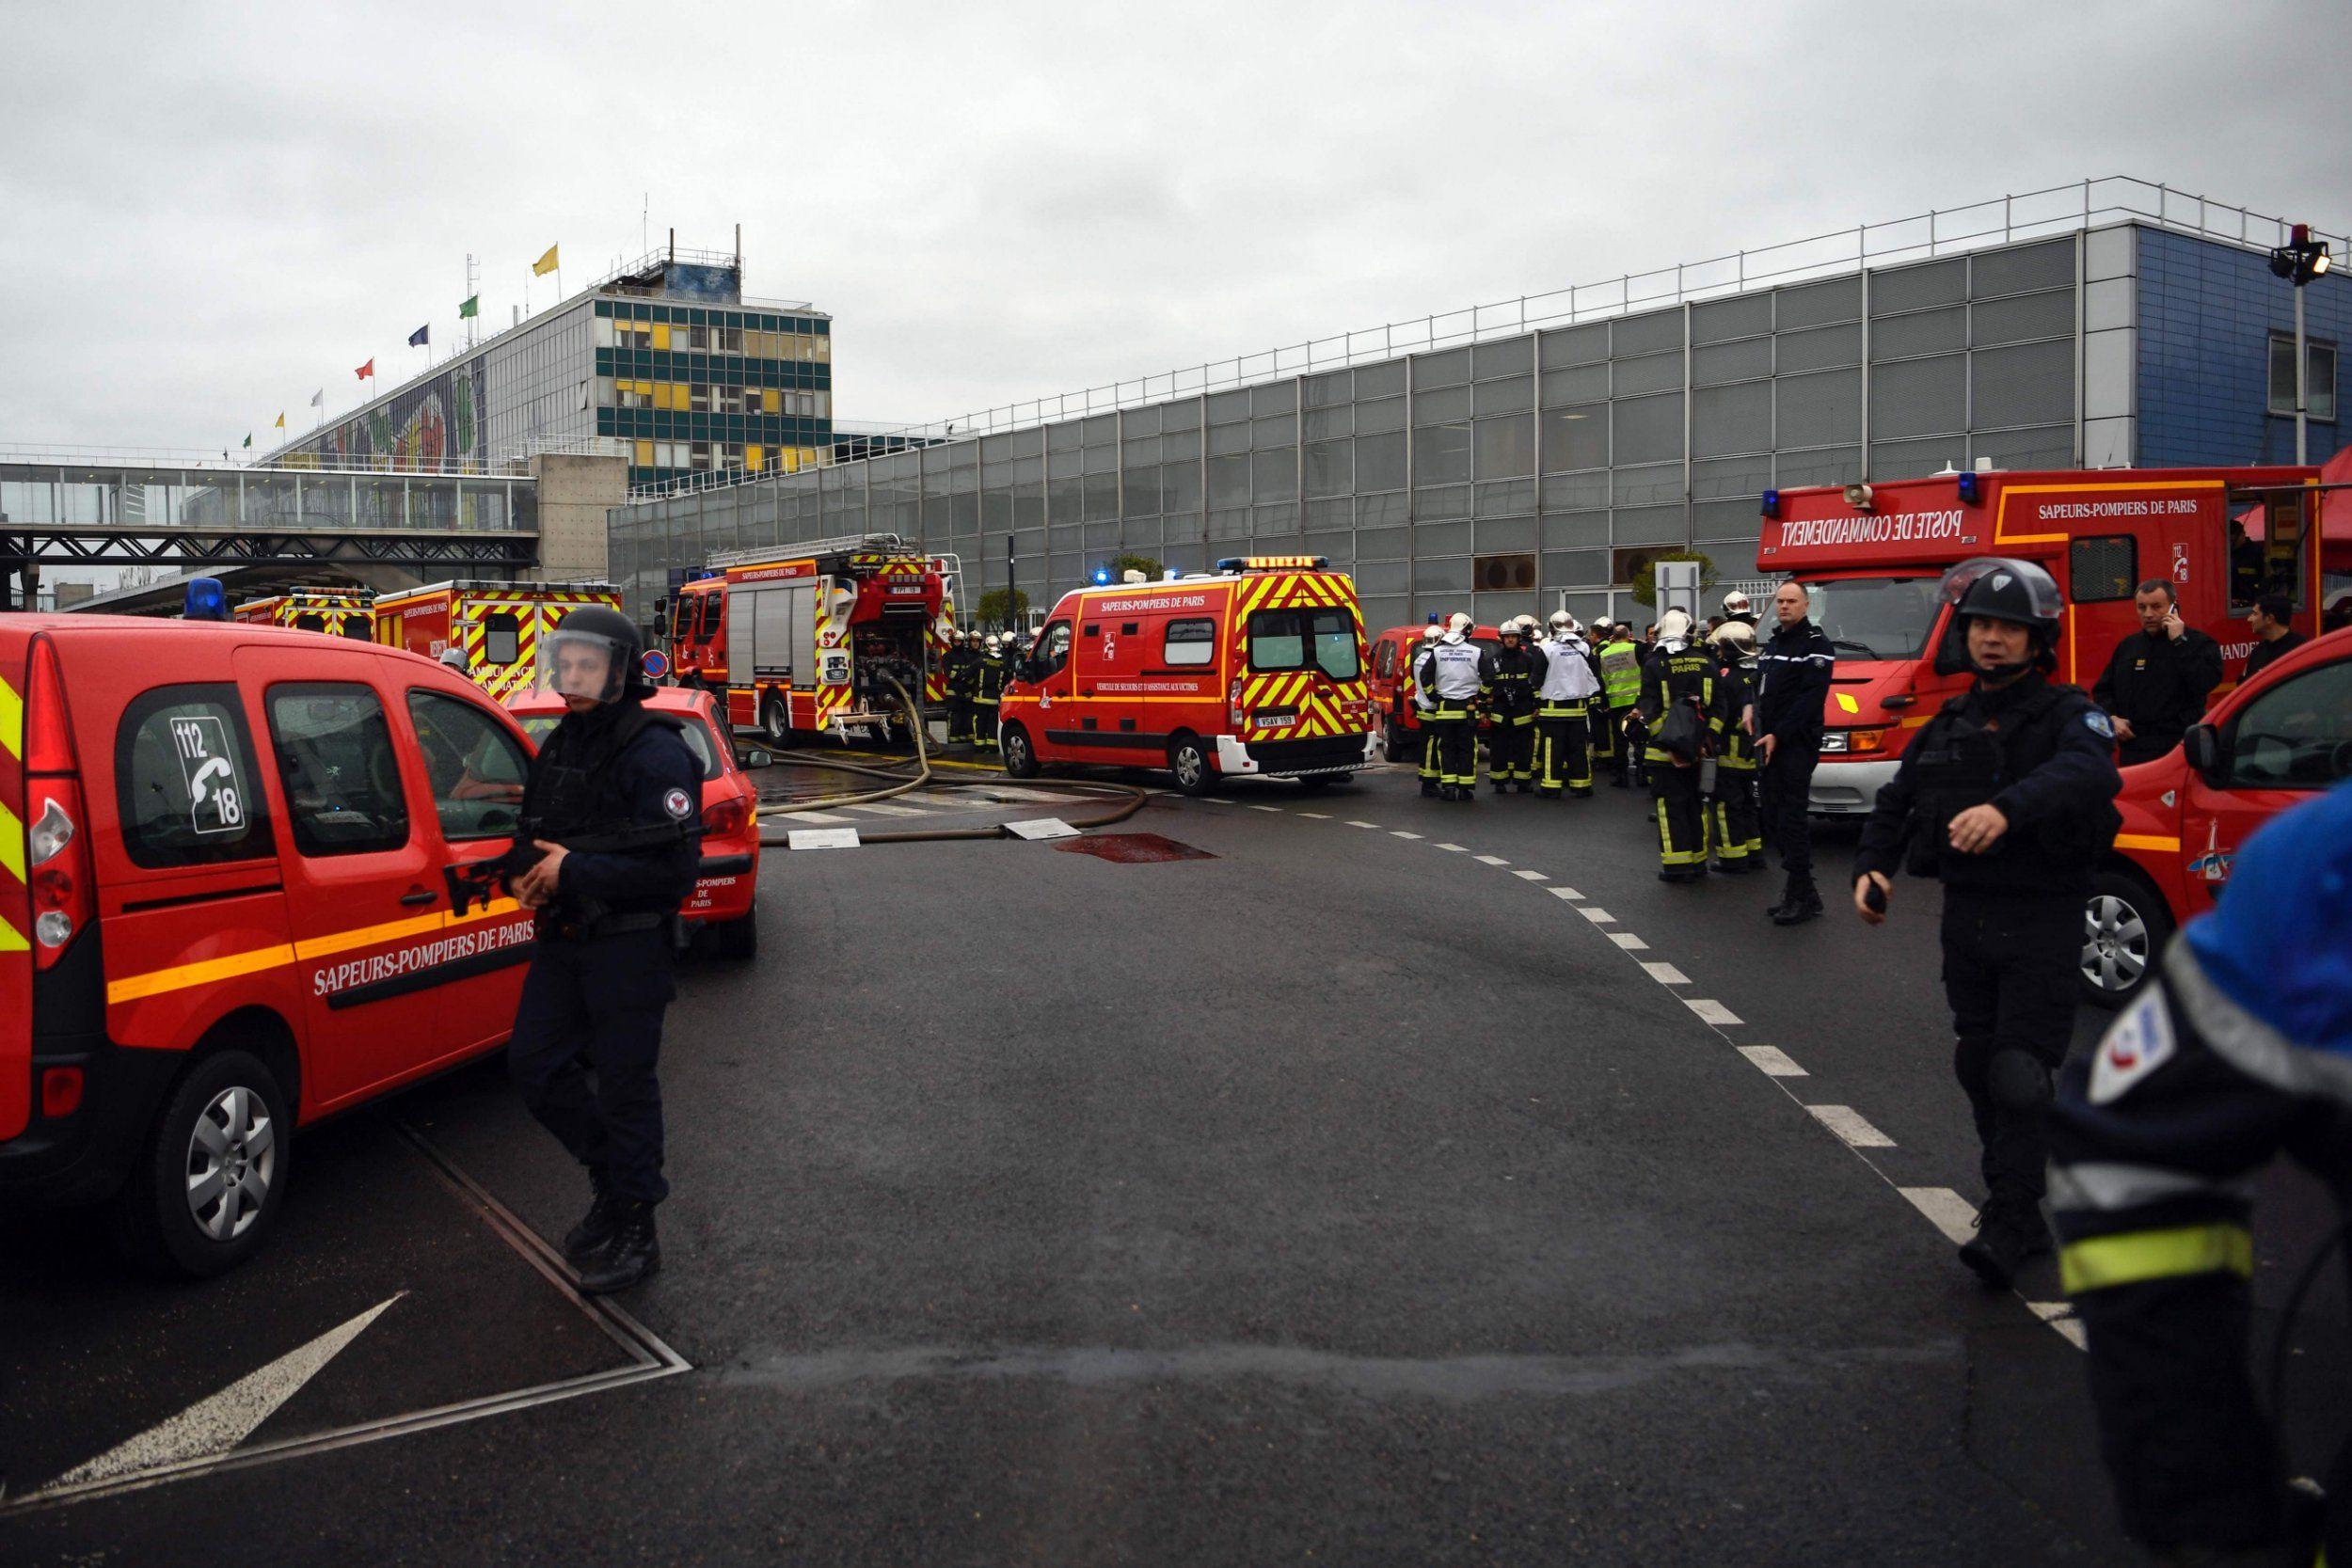 Paris airport shooting